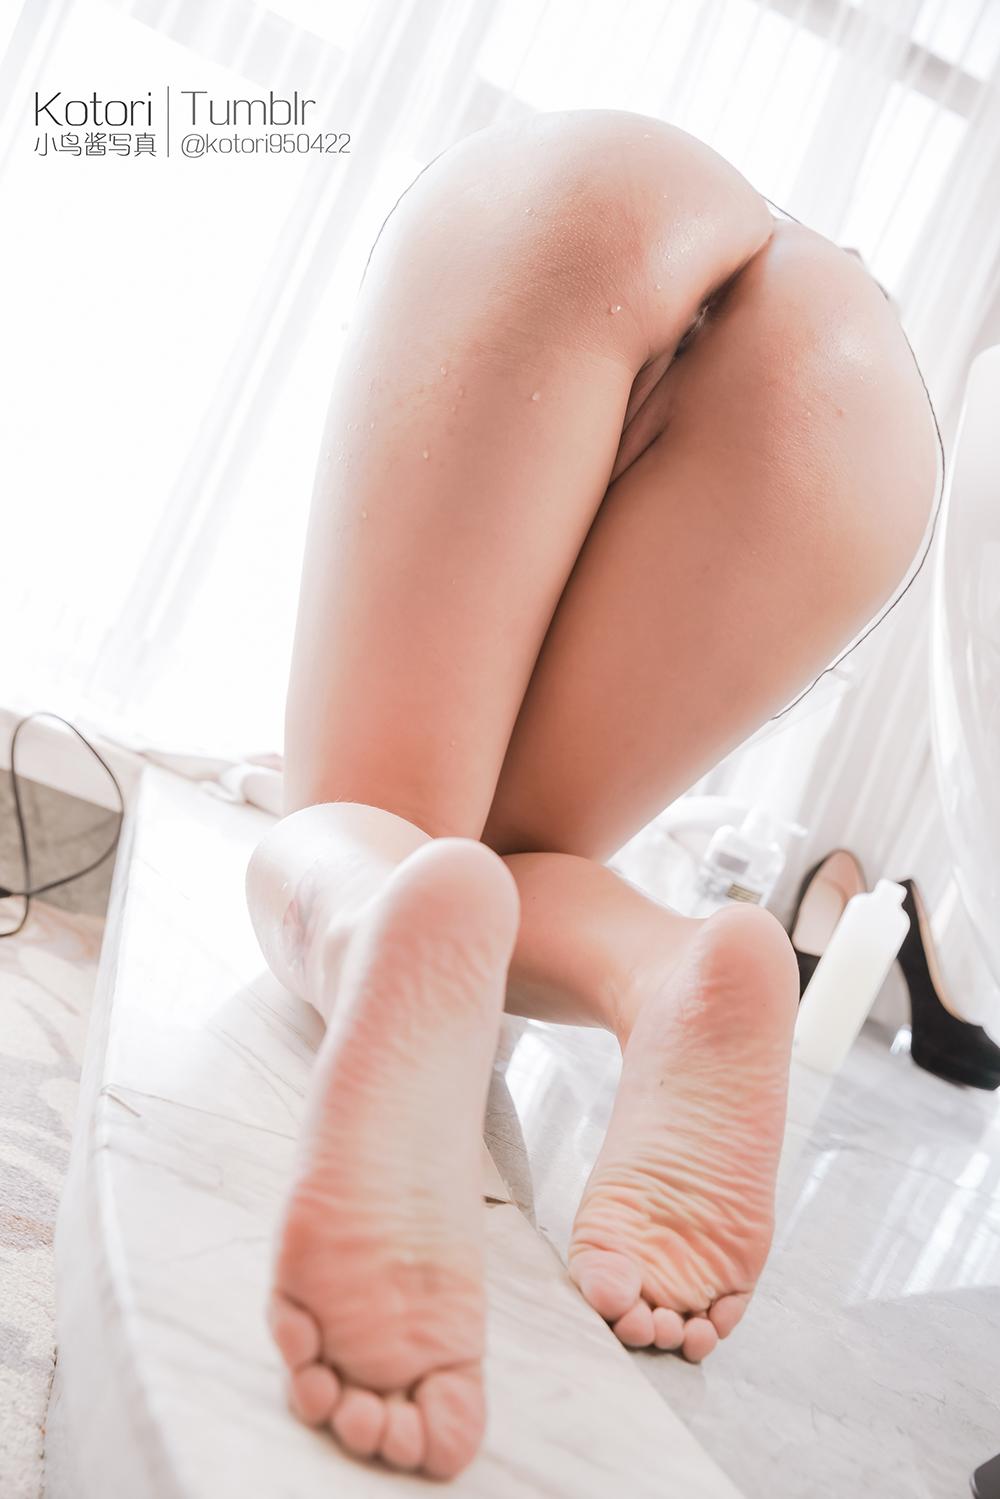 h82UdS - Cosplay girl Tumblr PR社 福利姬 小鸟酱 透明薄纱装